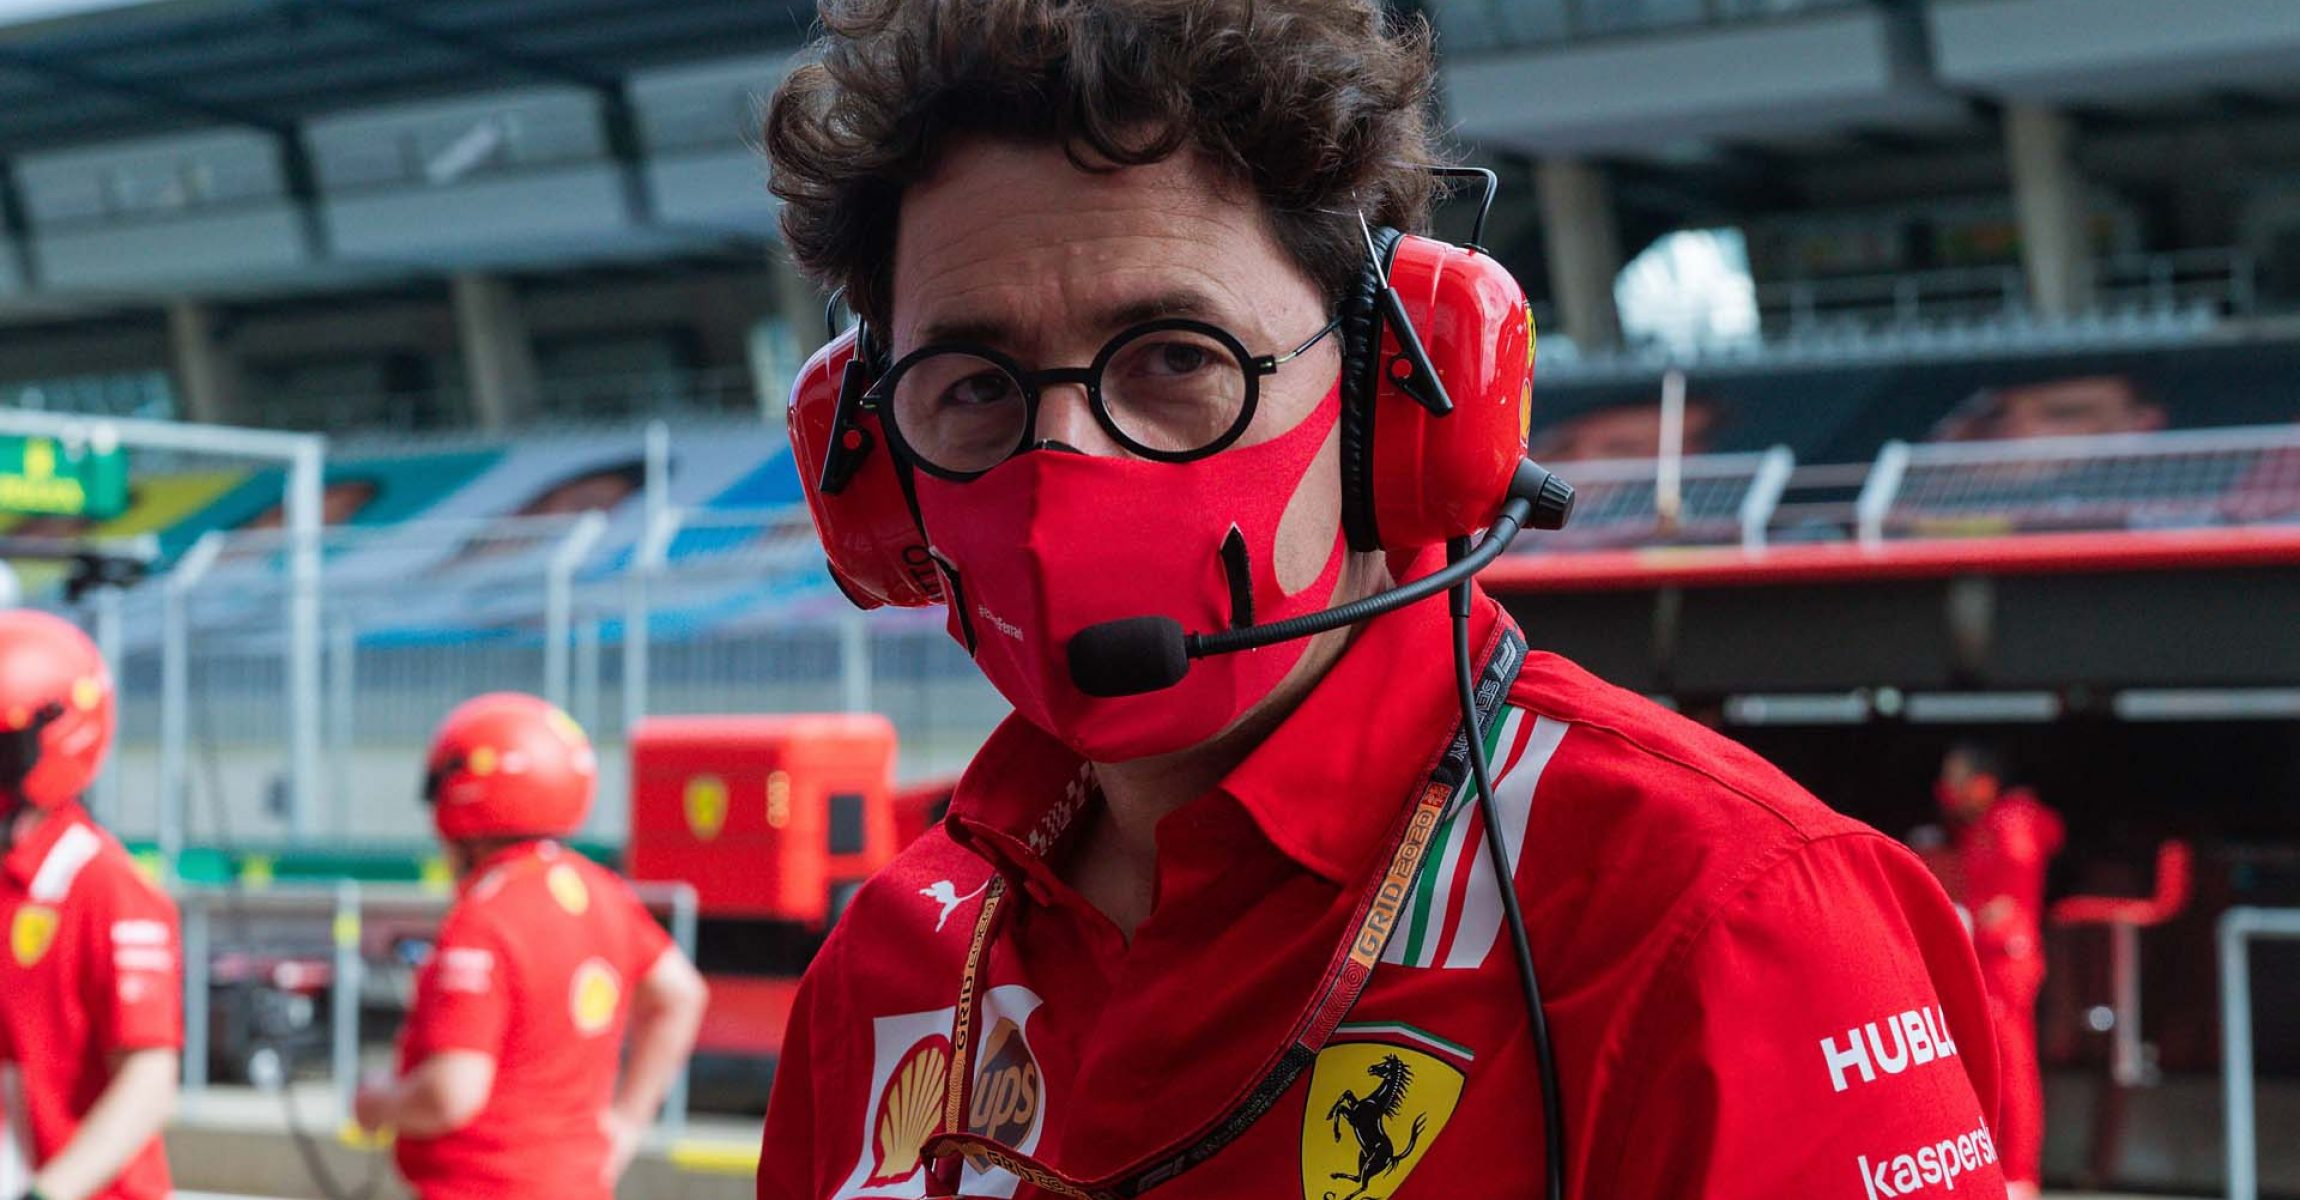 GP AUSTRIA F1/2020 - VENERDÌ 03/07/2020 credit: @Scuderia Ferrari Press Office Mattia Binotto